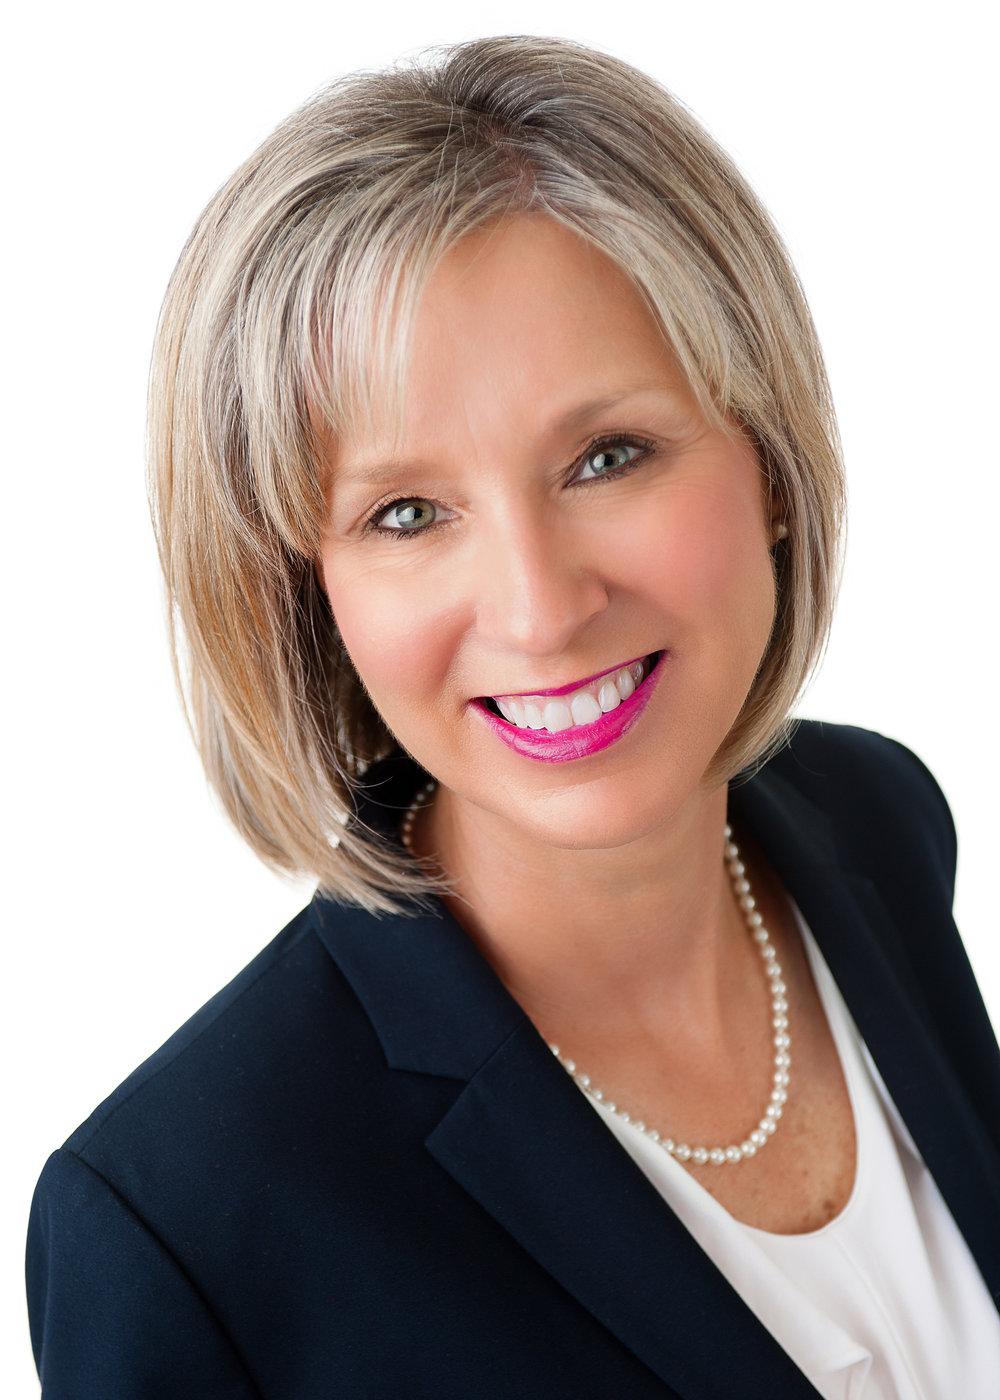 Kimberly S. McCann - Exec. Chair